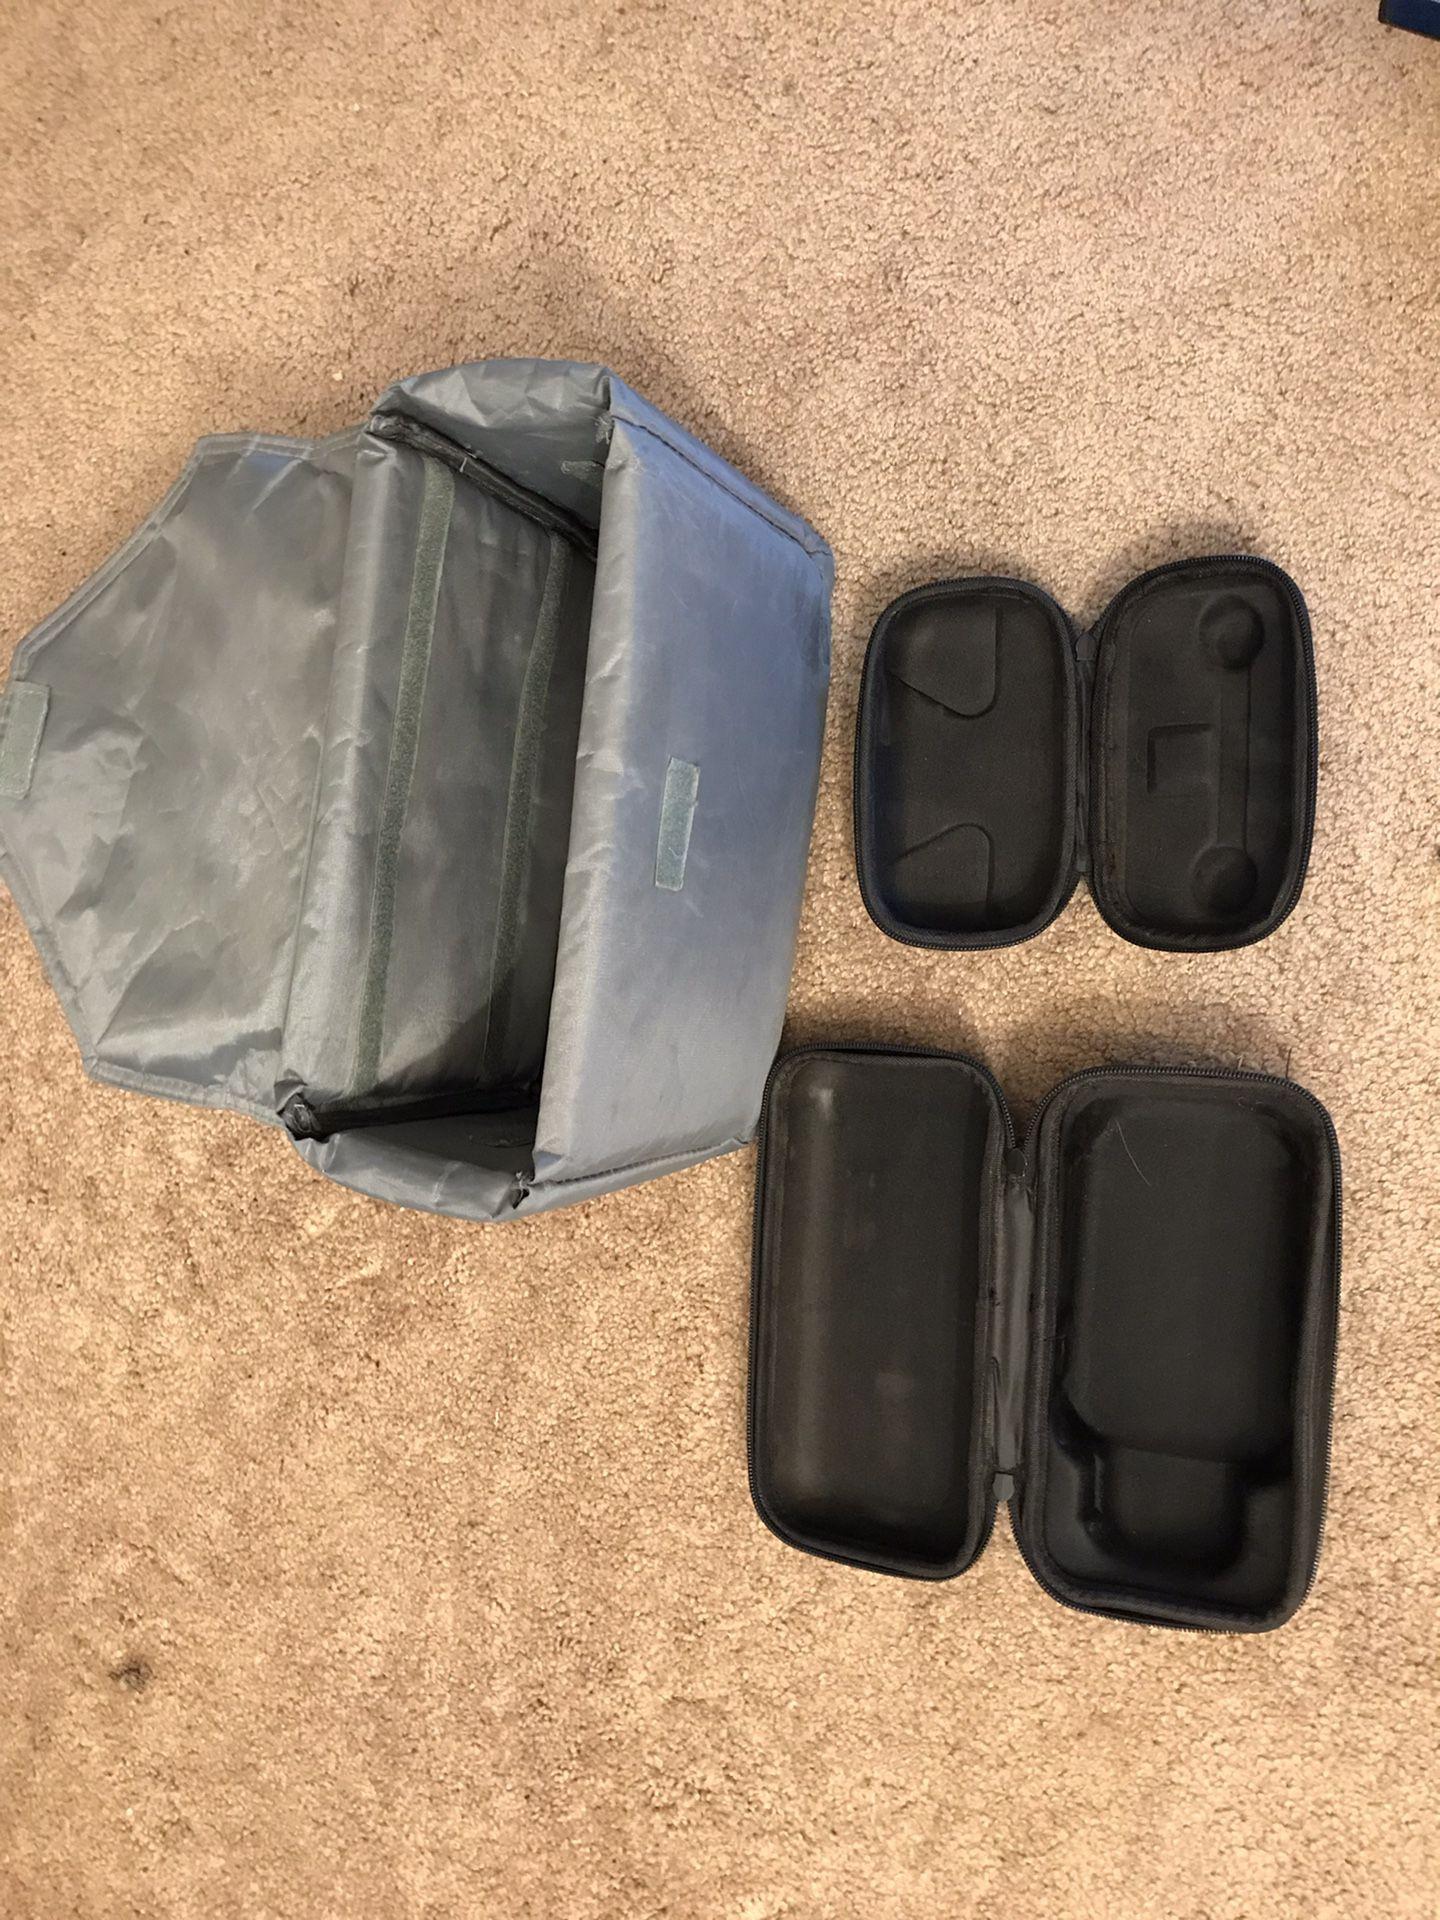 DJI Mavic pro bundle up with 3 extra batteries + more